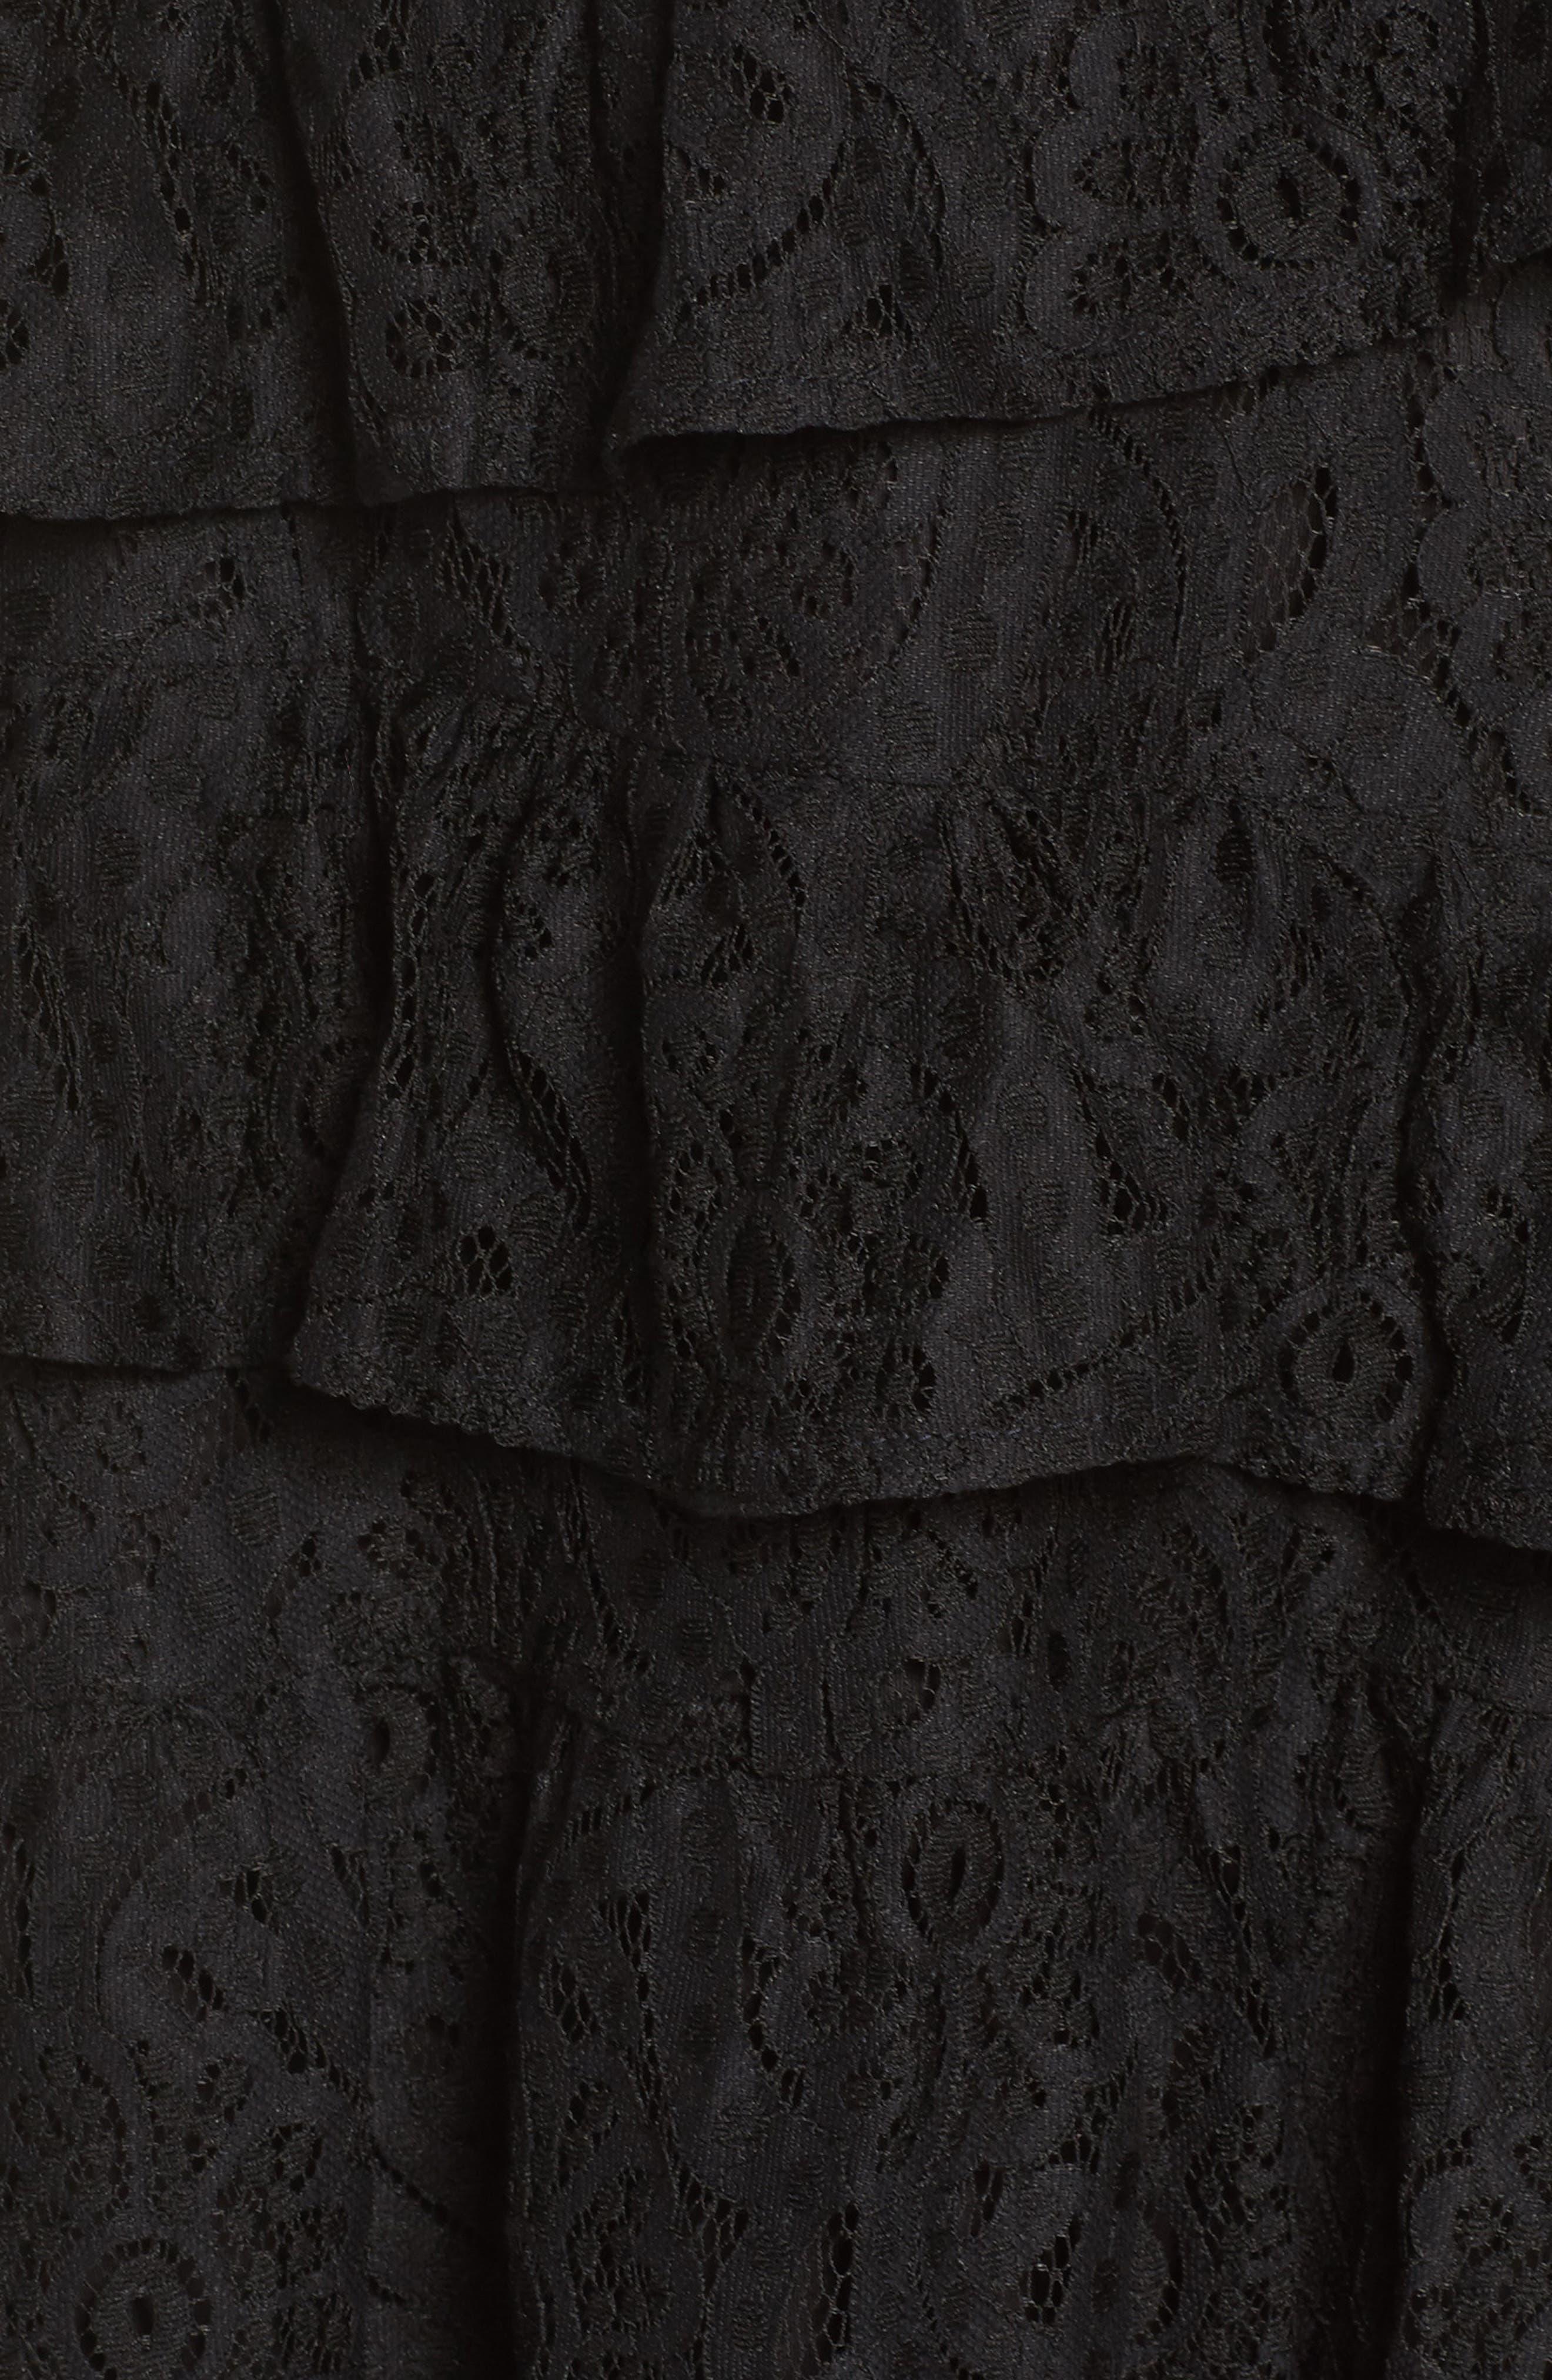 Ruffle Lace High/Low dress,                             Alternate thumbnail 6, color,                             BLACK